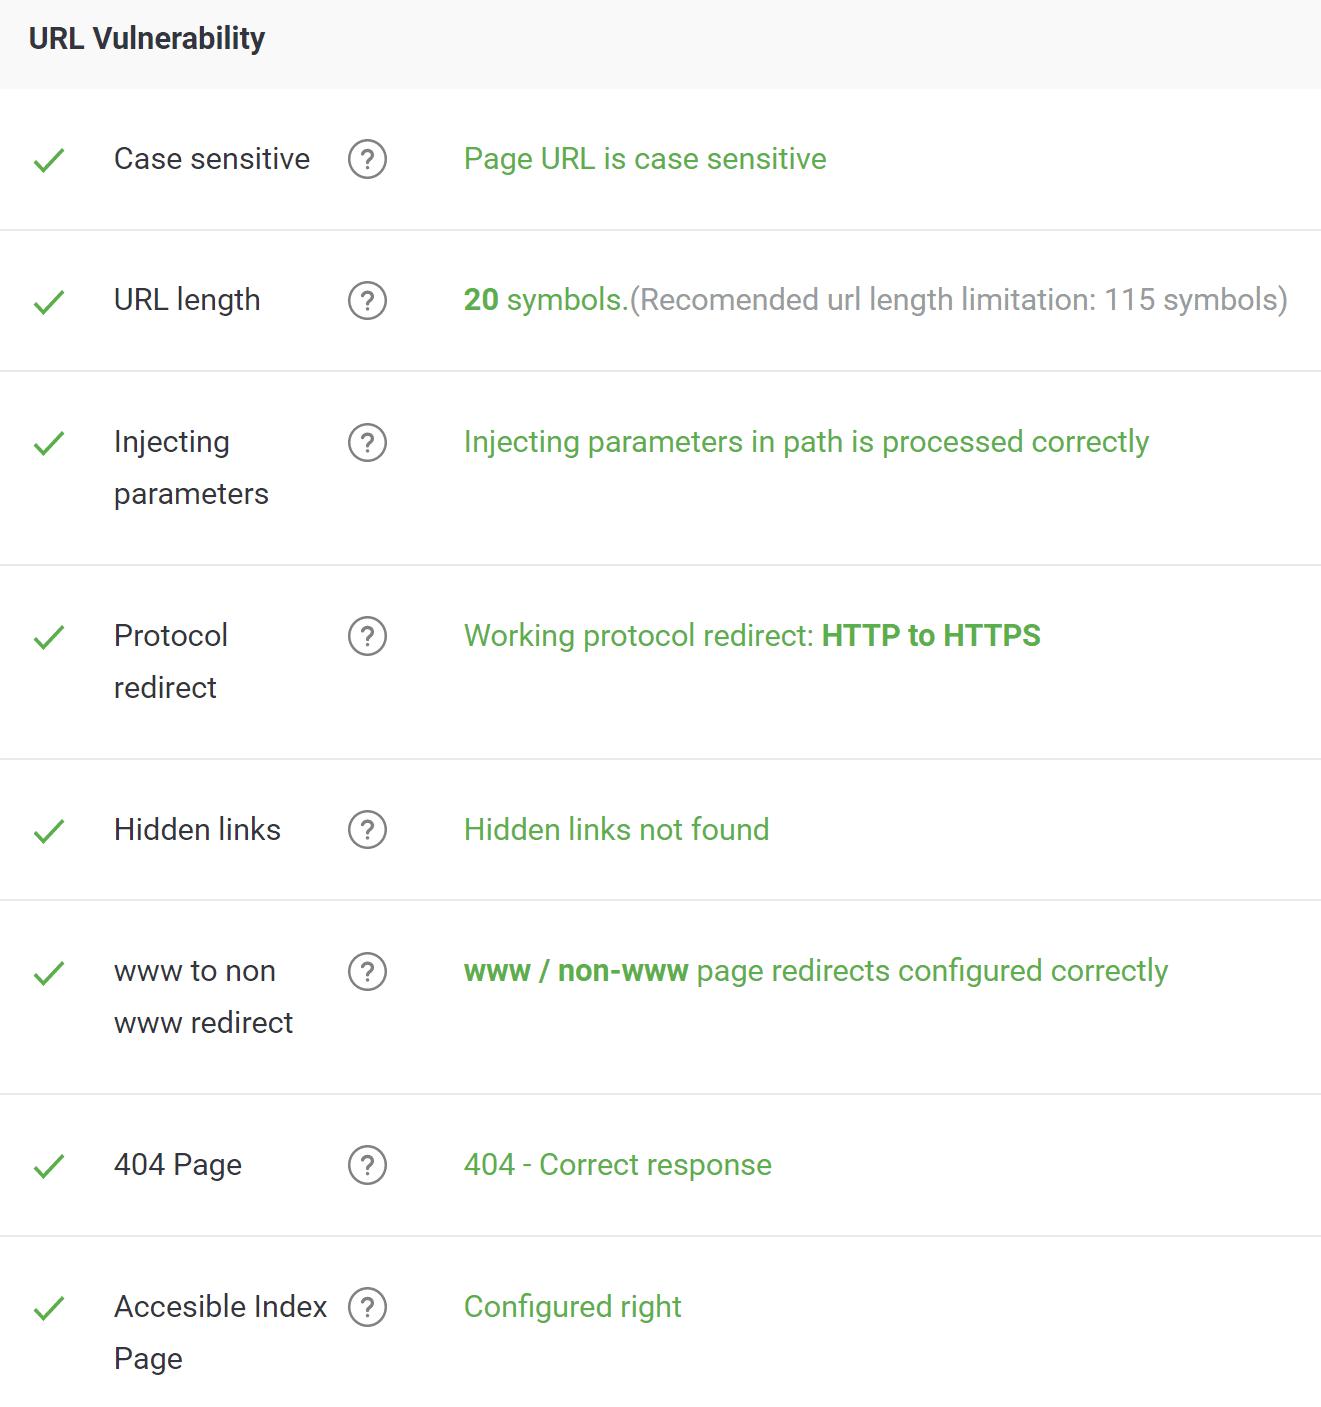 URL vulnerability